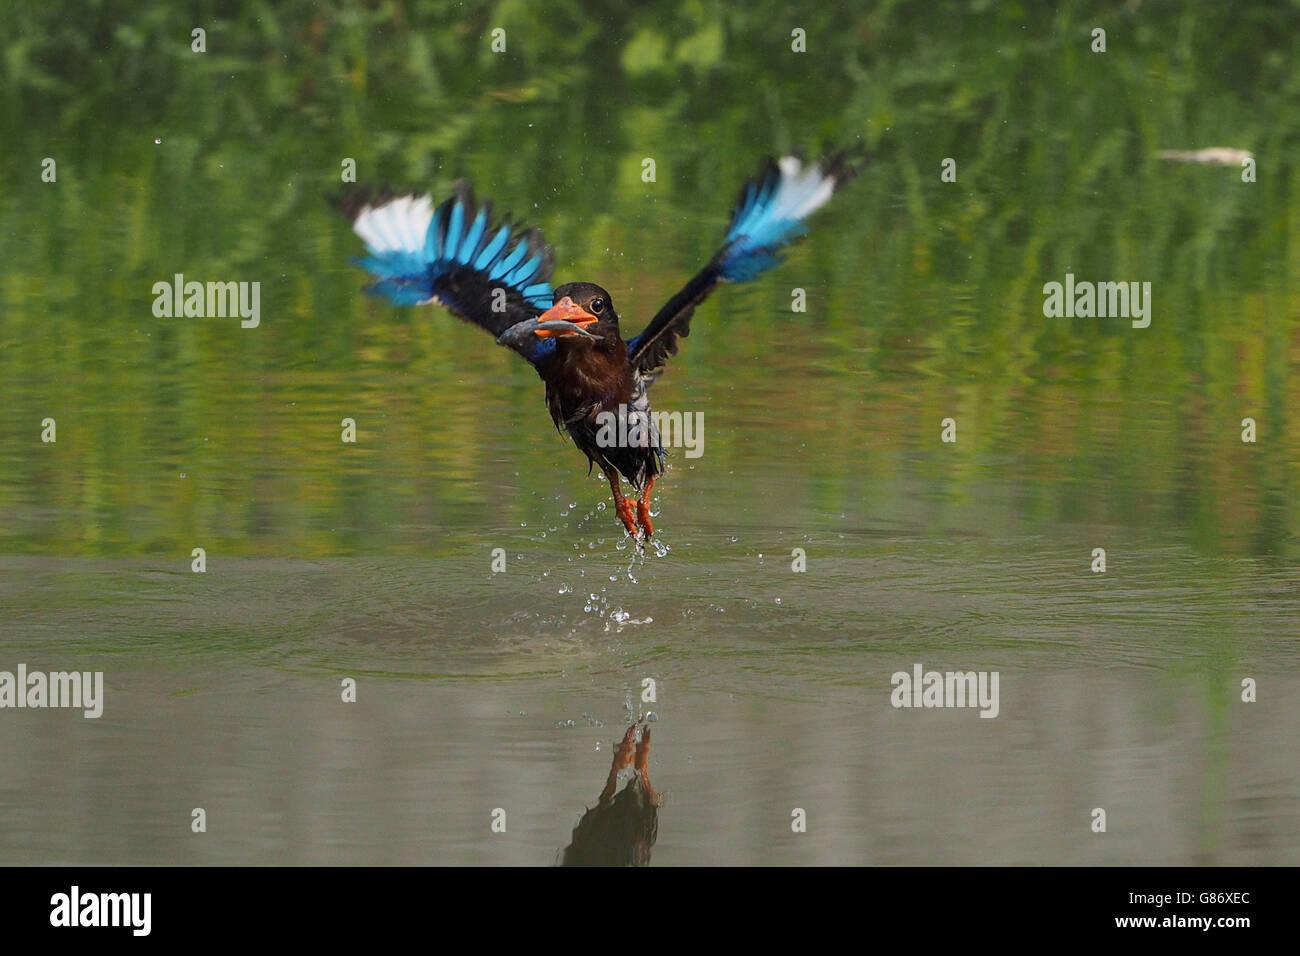 Kingfisher bird catching fish in river, Jember, Indonesia - Stock Image